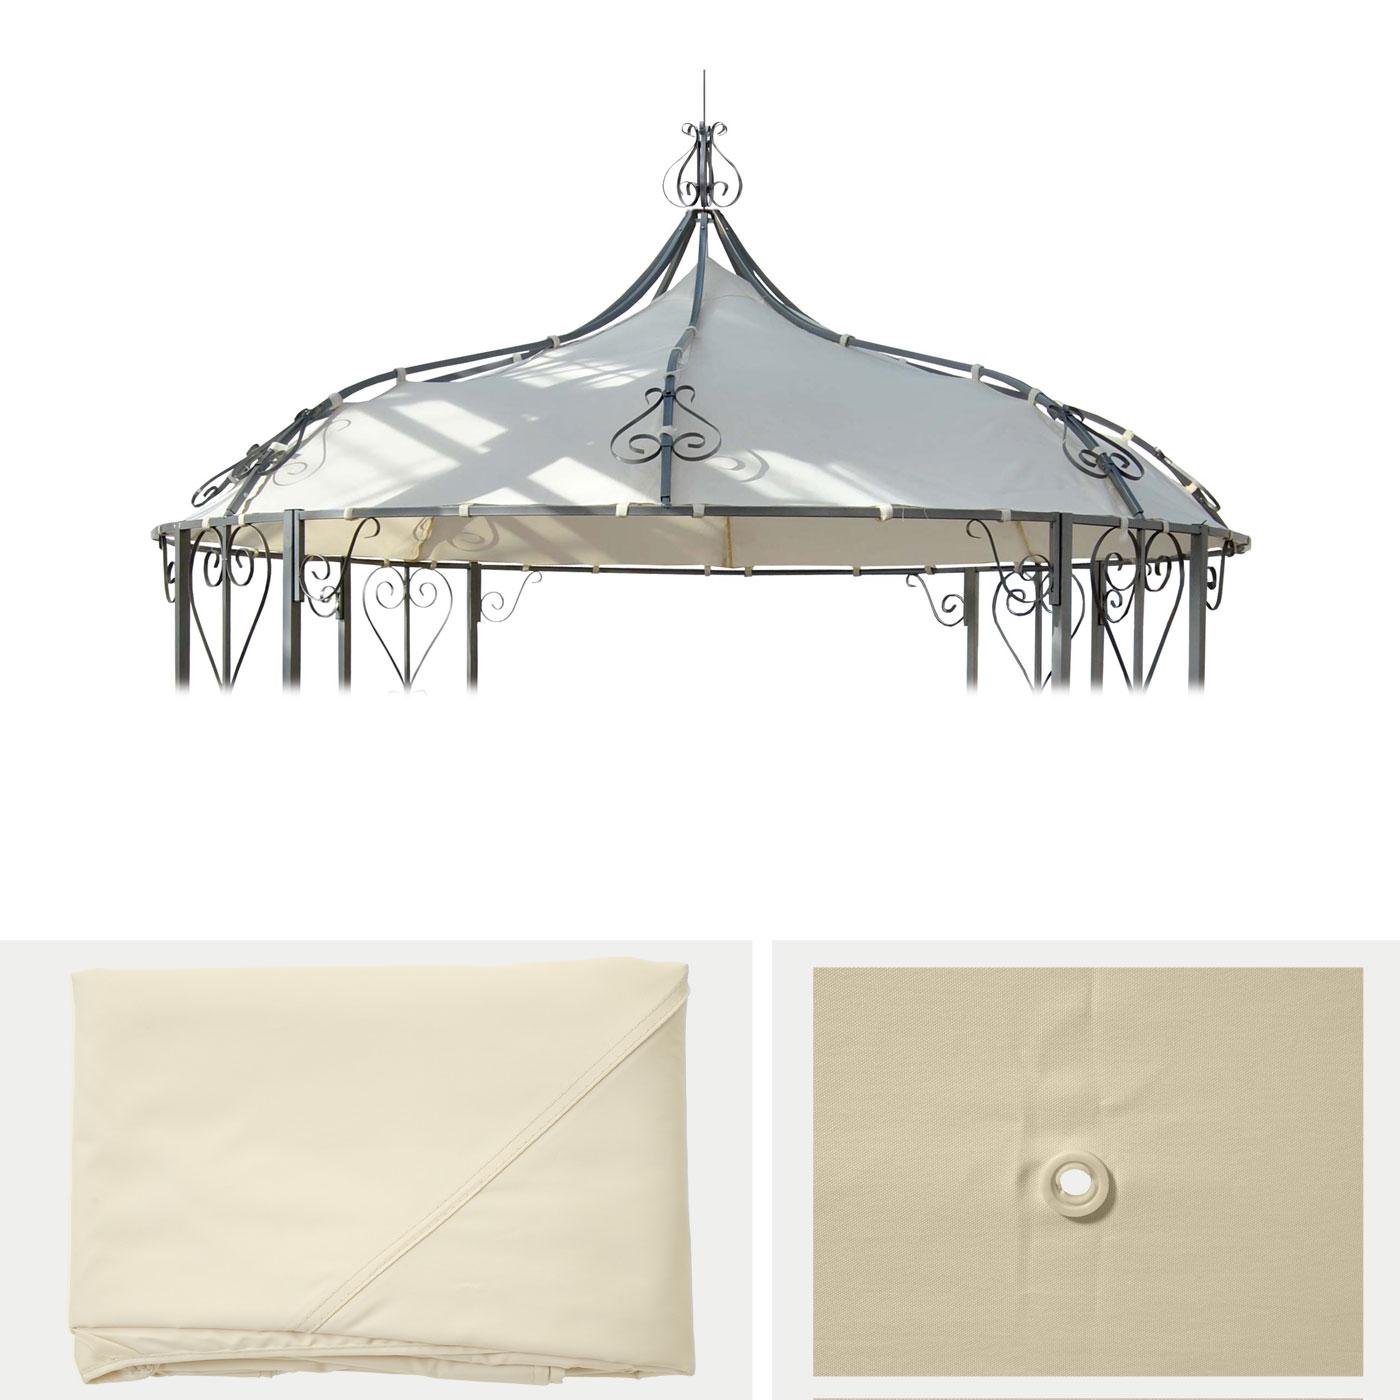 ersatzbezug f r dach pergola pavillon almeria 3m creme. Black Bedroom Furniture Sets. Home Design Ideas